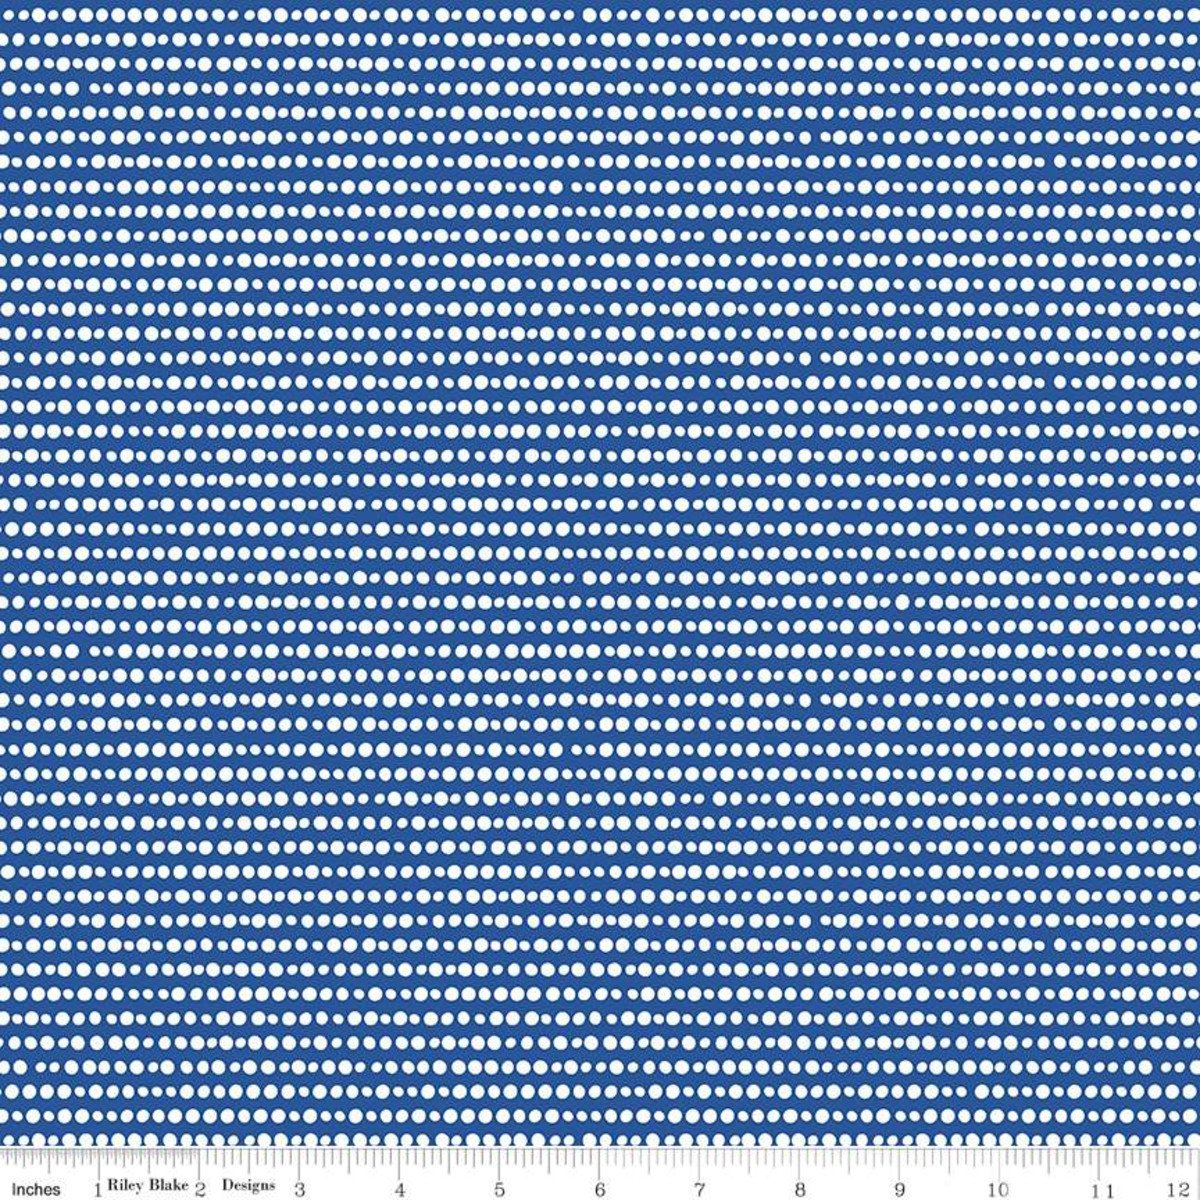 Grl Pwr Dots Blue